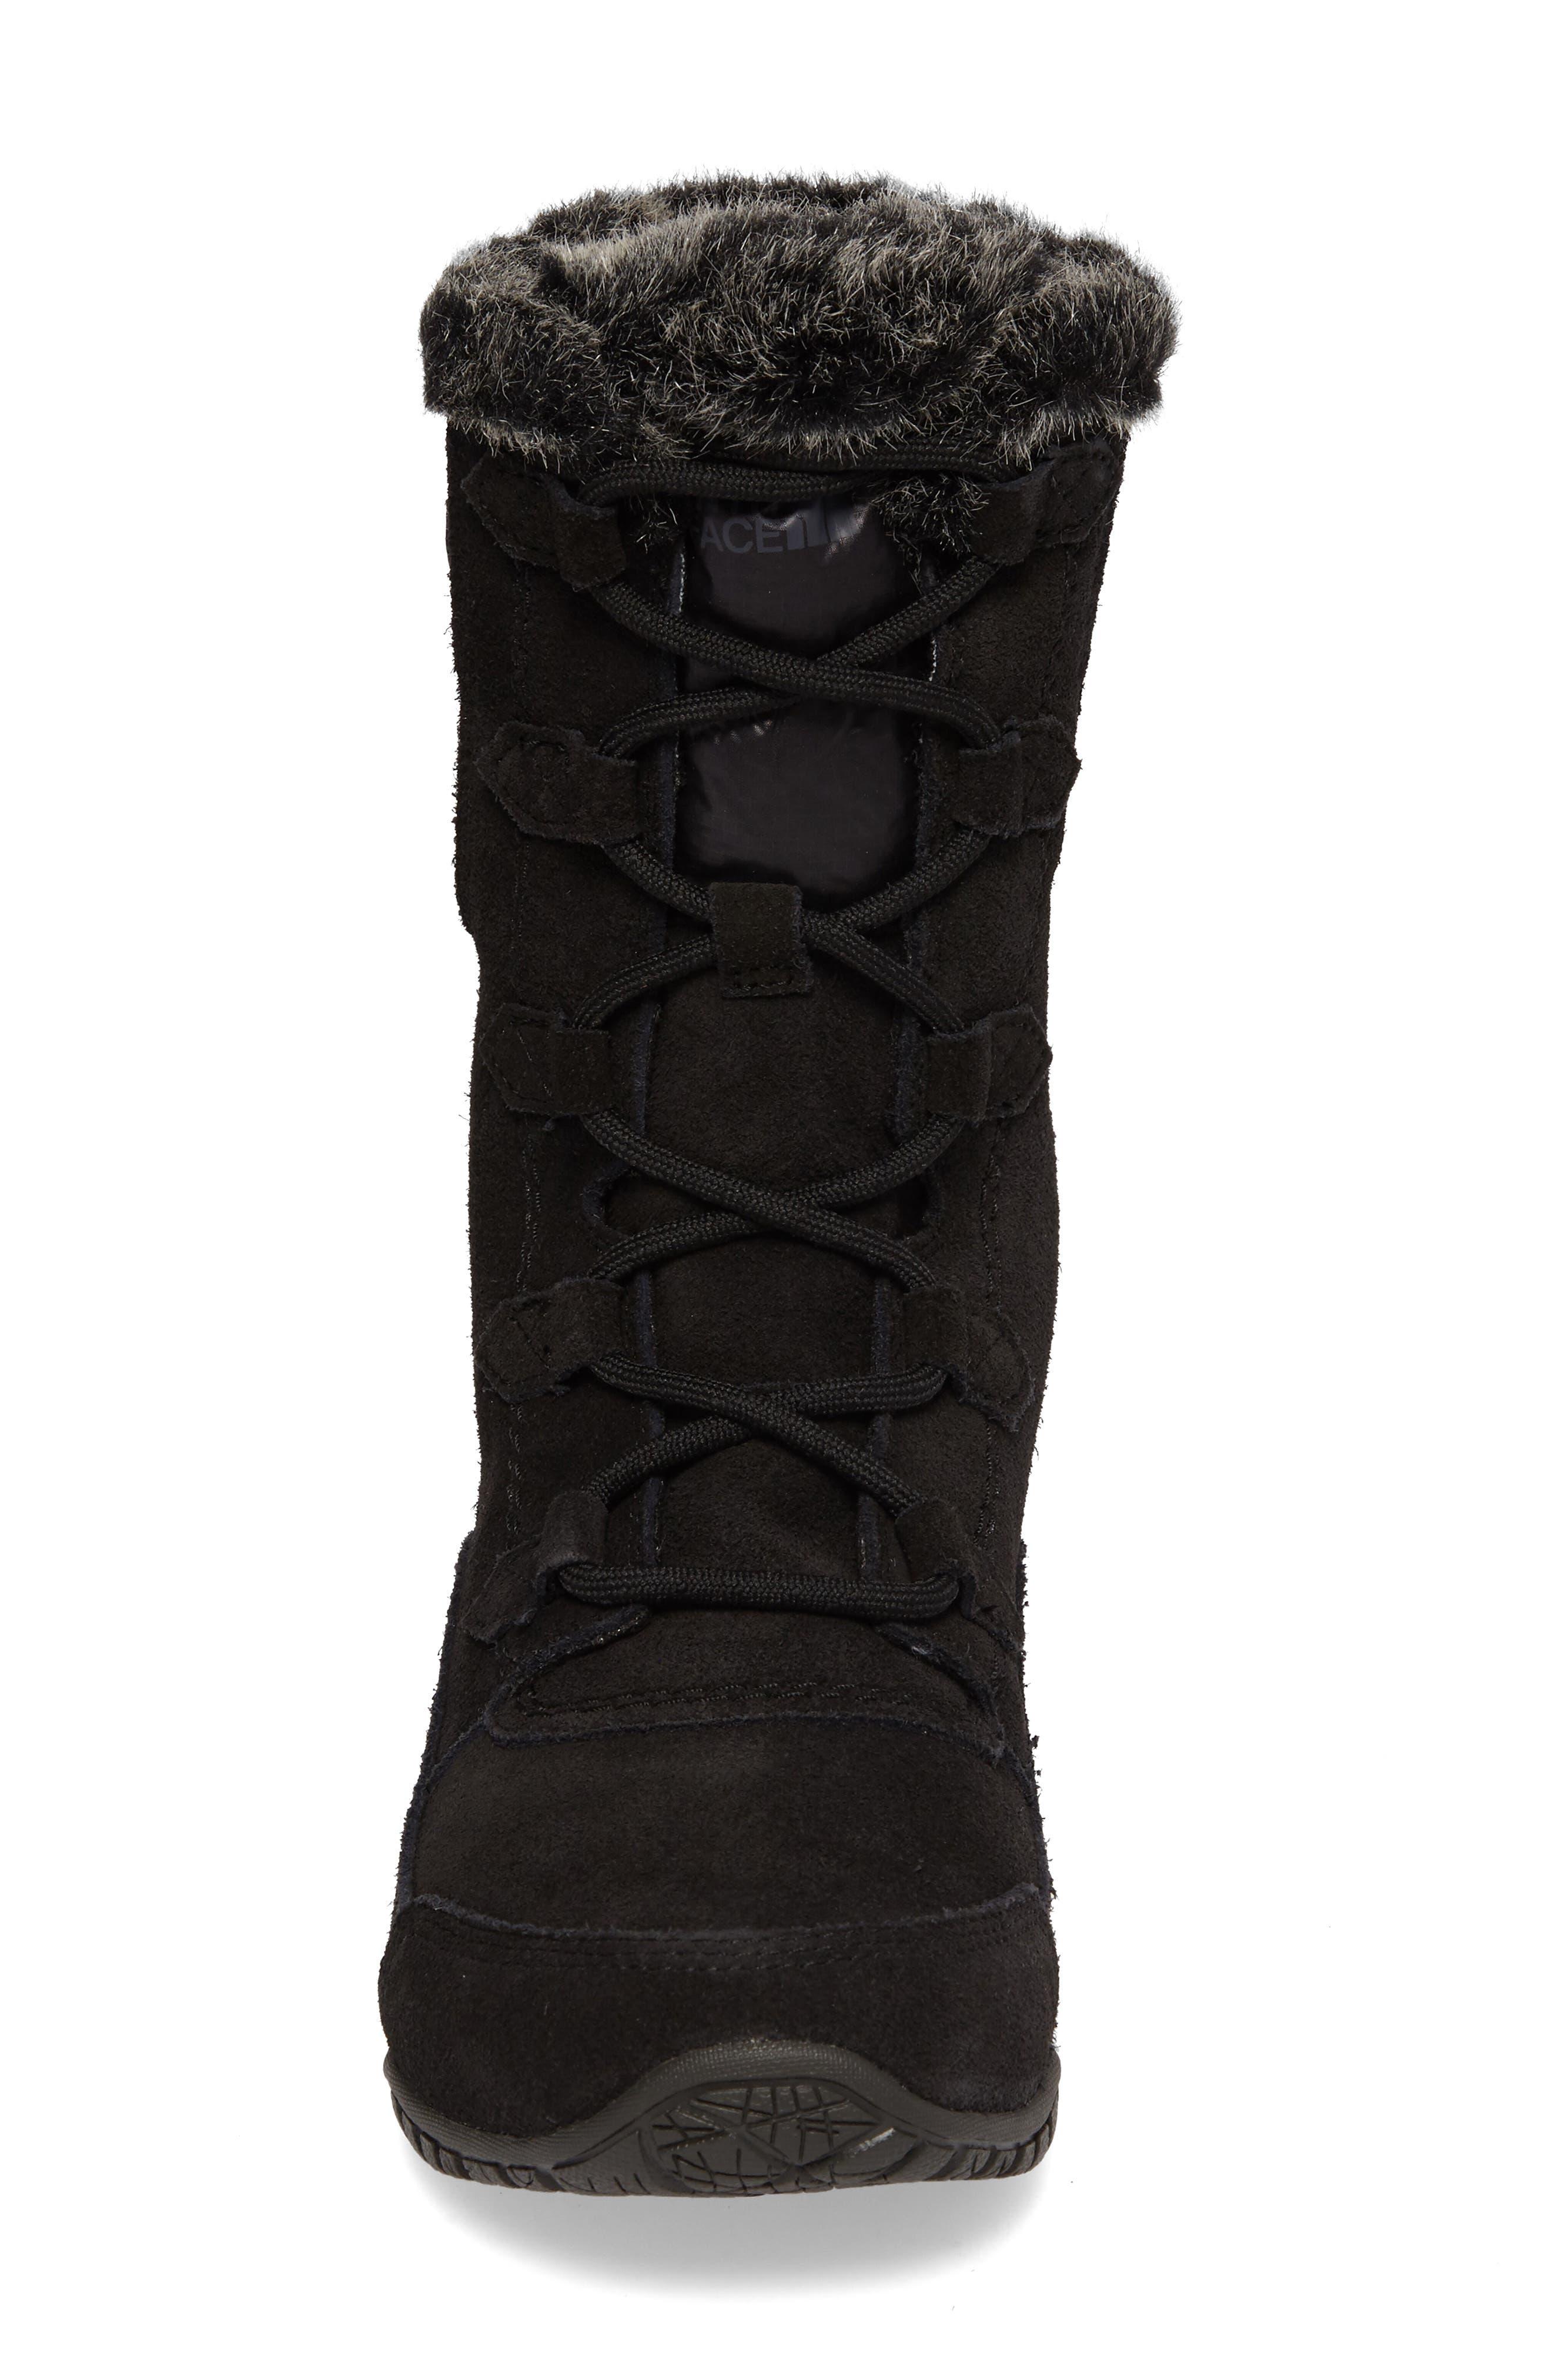 Nuptse Purna II Waterproof PrimaLoft<sup>®</sup> Silver Eco Insulated Winter Boot,                             Alternate thumbnail 5, color,                             Tnf Black/ Beluga Grey